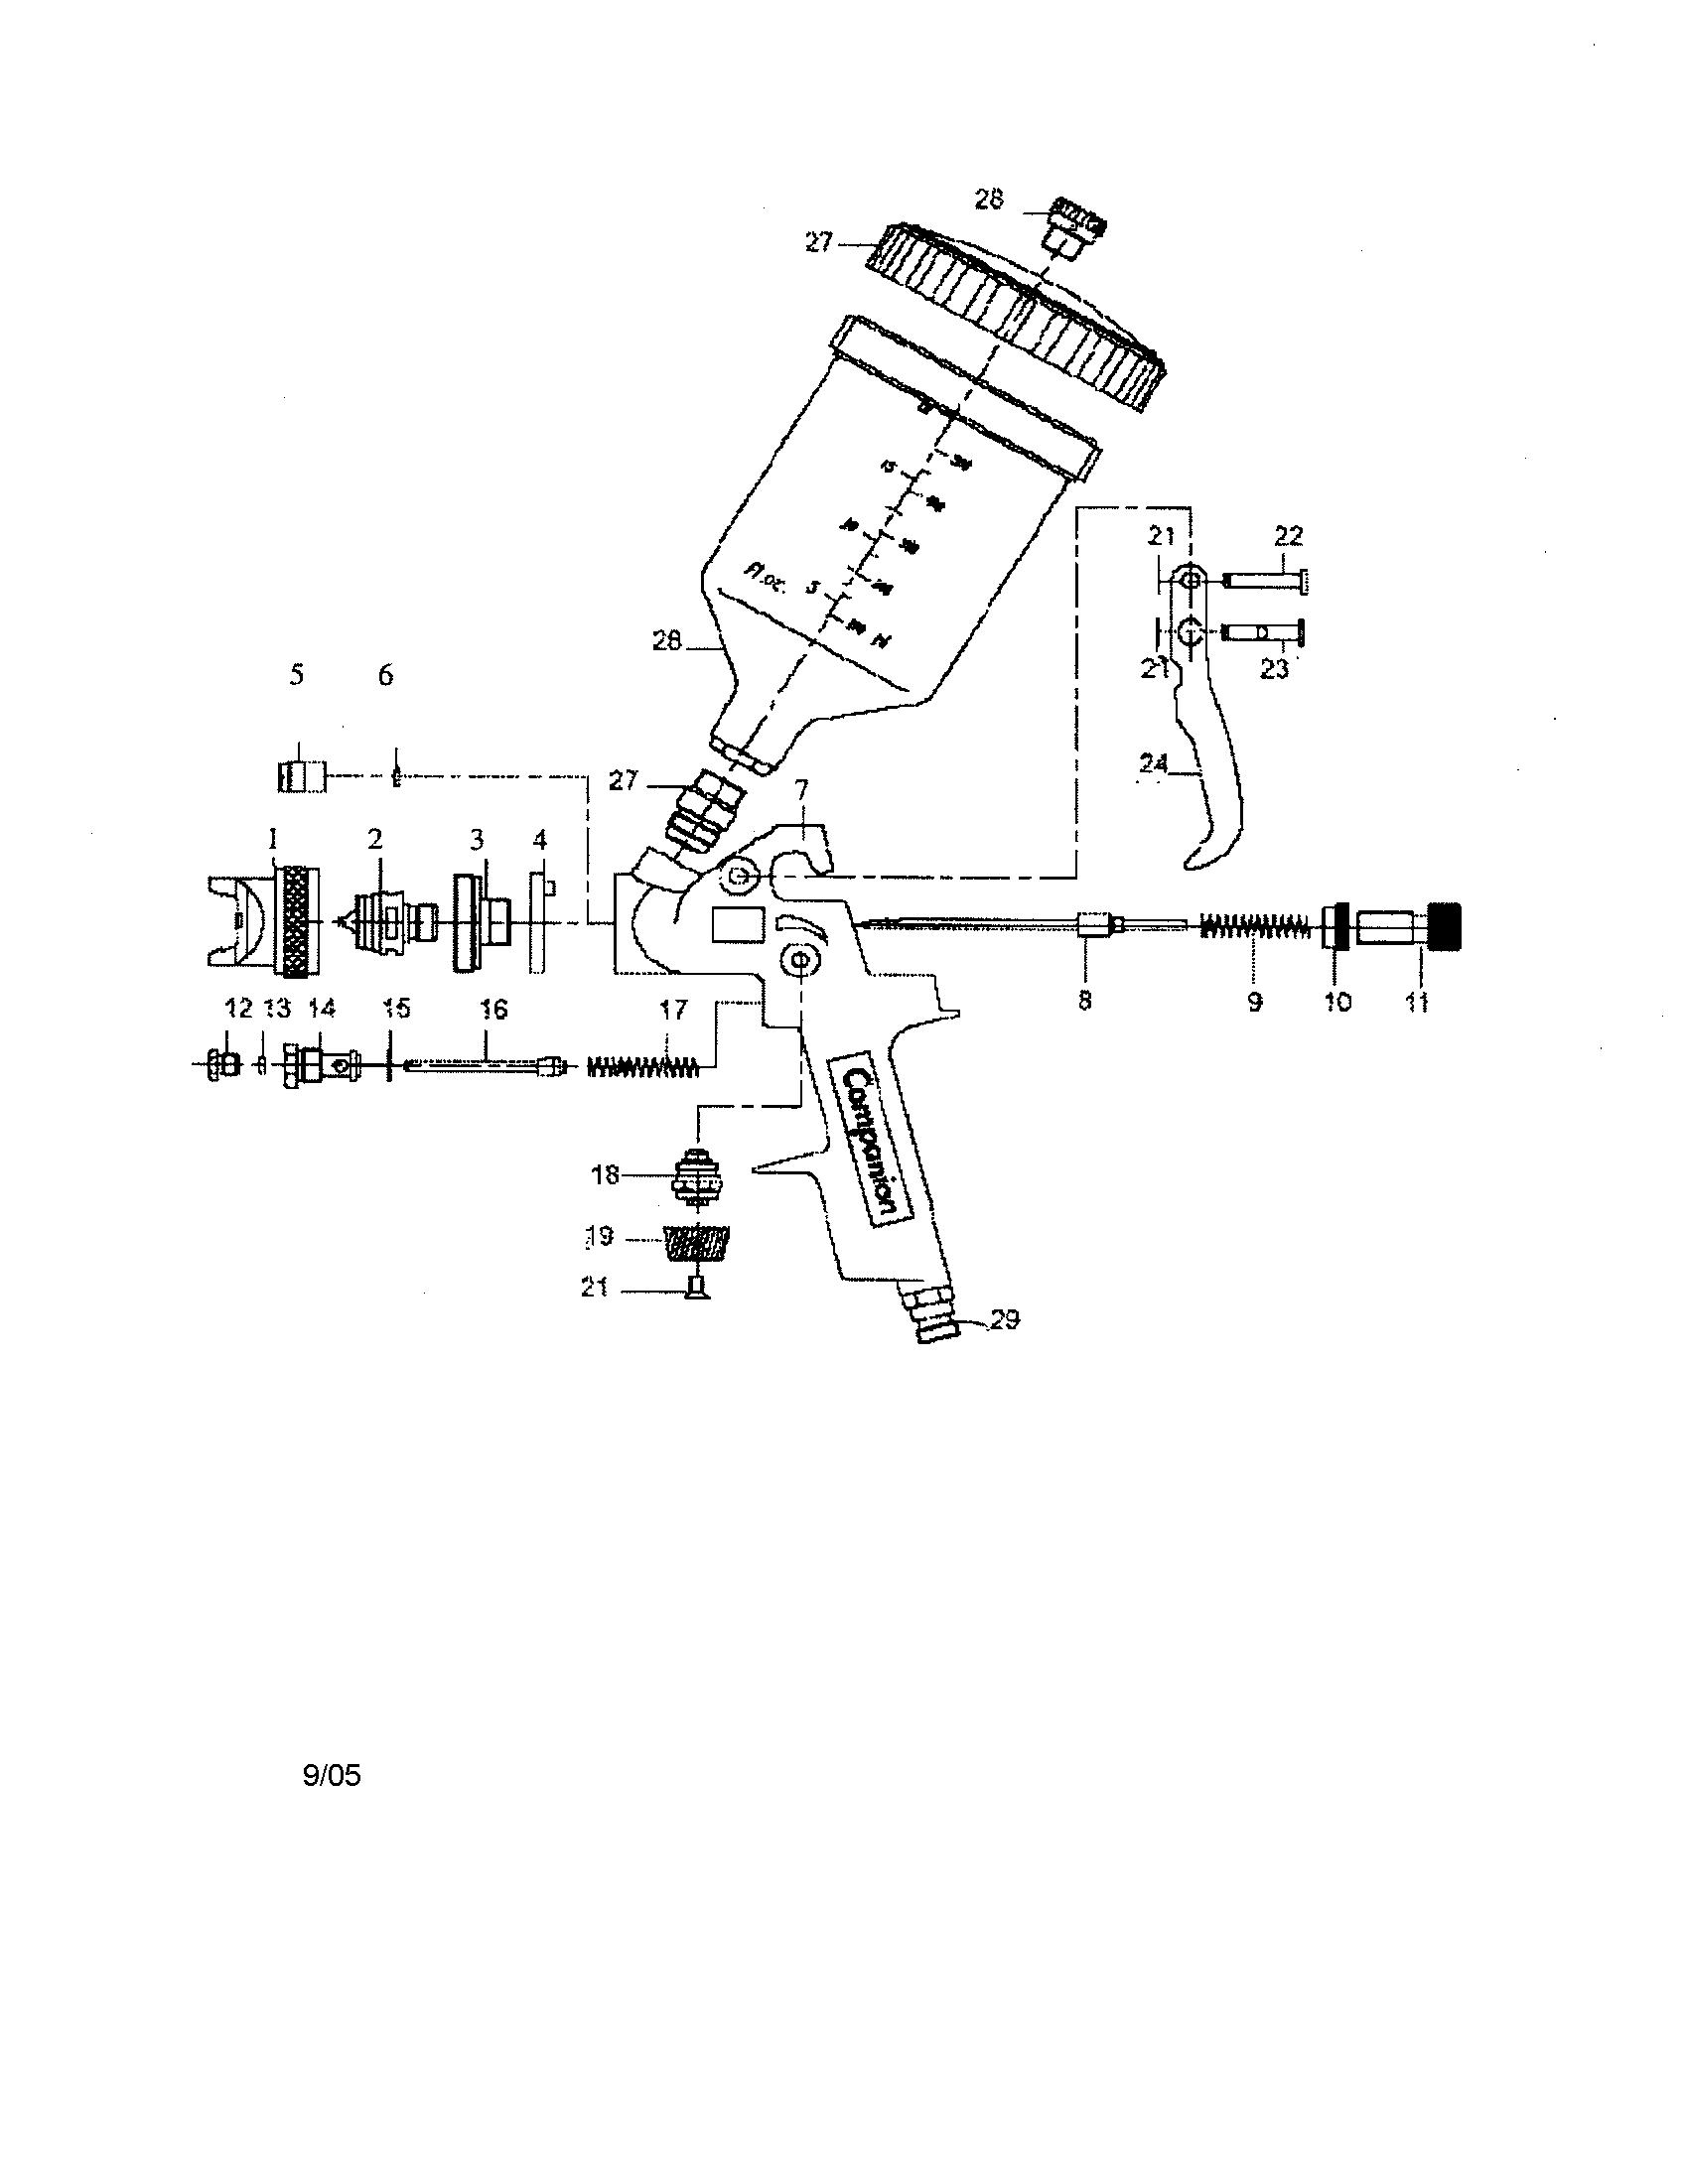 Hvlp Spray Gun Parts Diagram | Companion Model 875181180 Spray Gun Genuine Parts